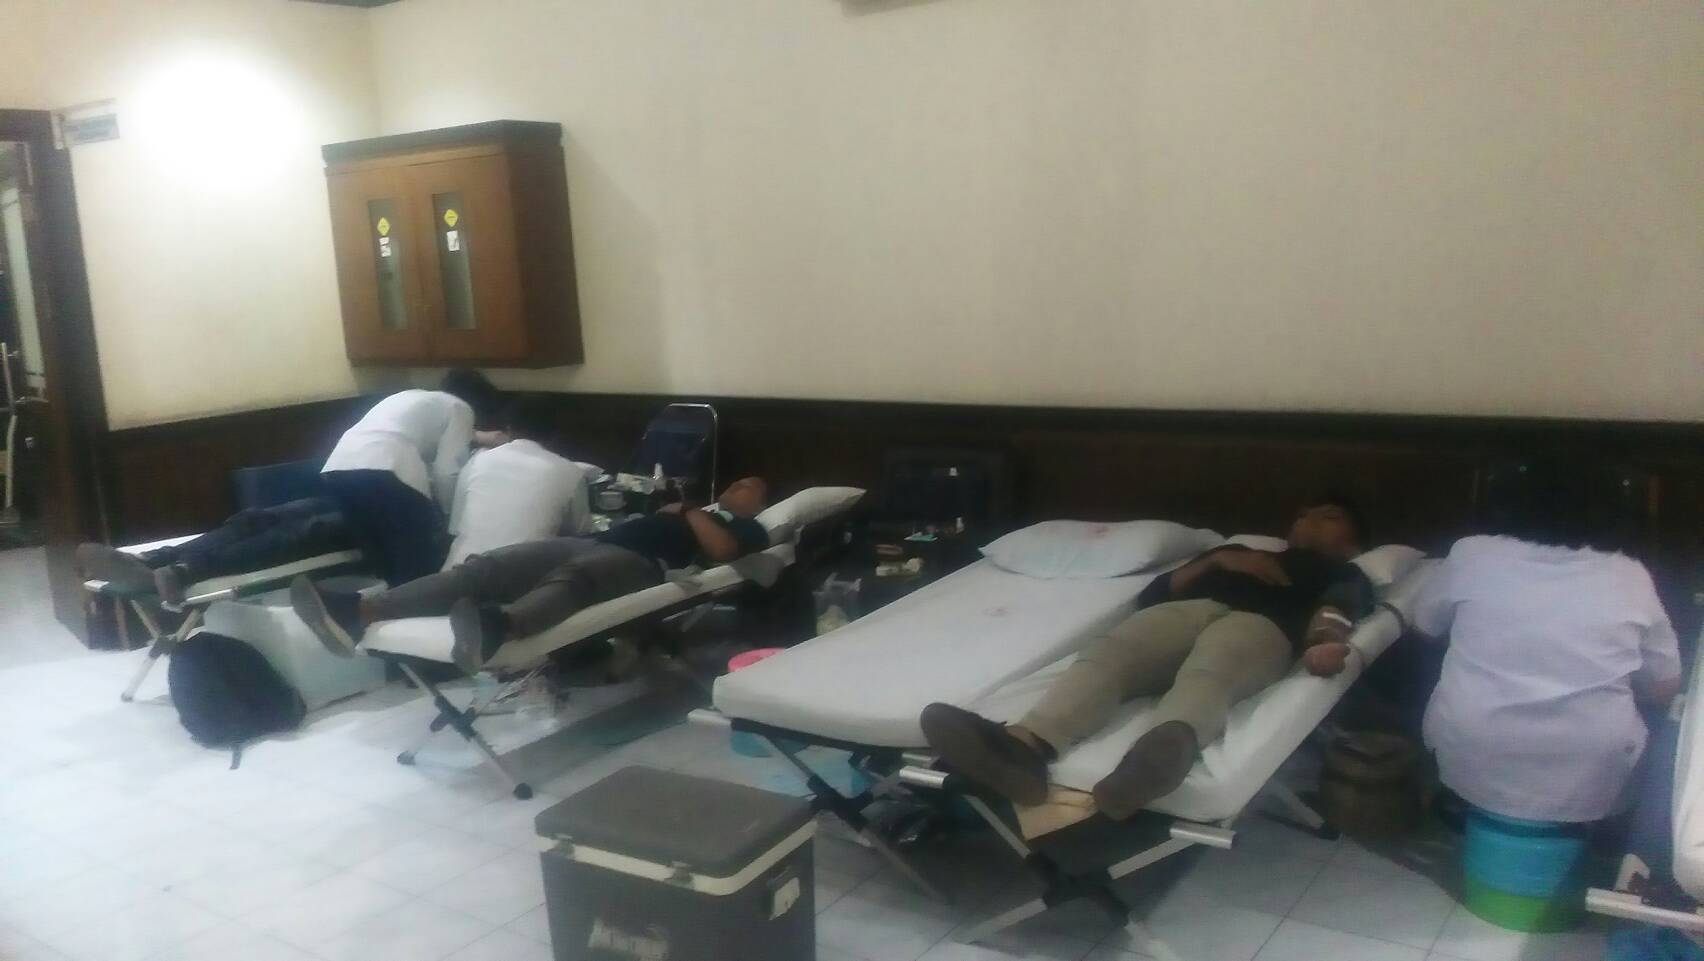 PMK, KMK, dan KMFH Gelar Kegiatan Donor Darah